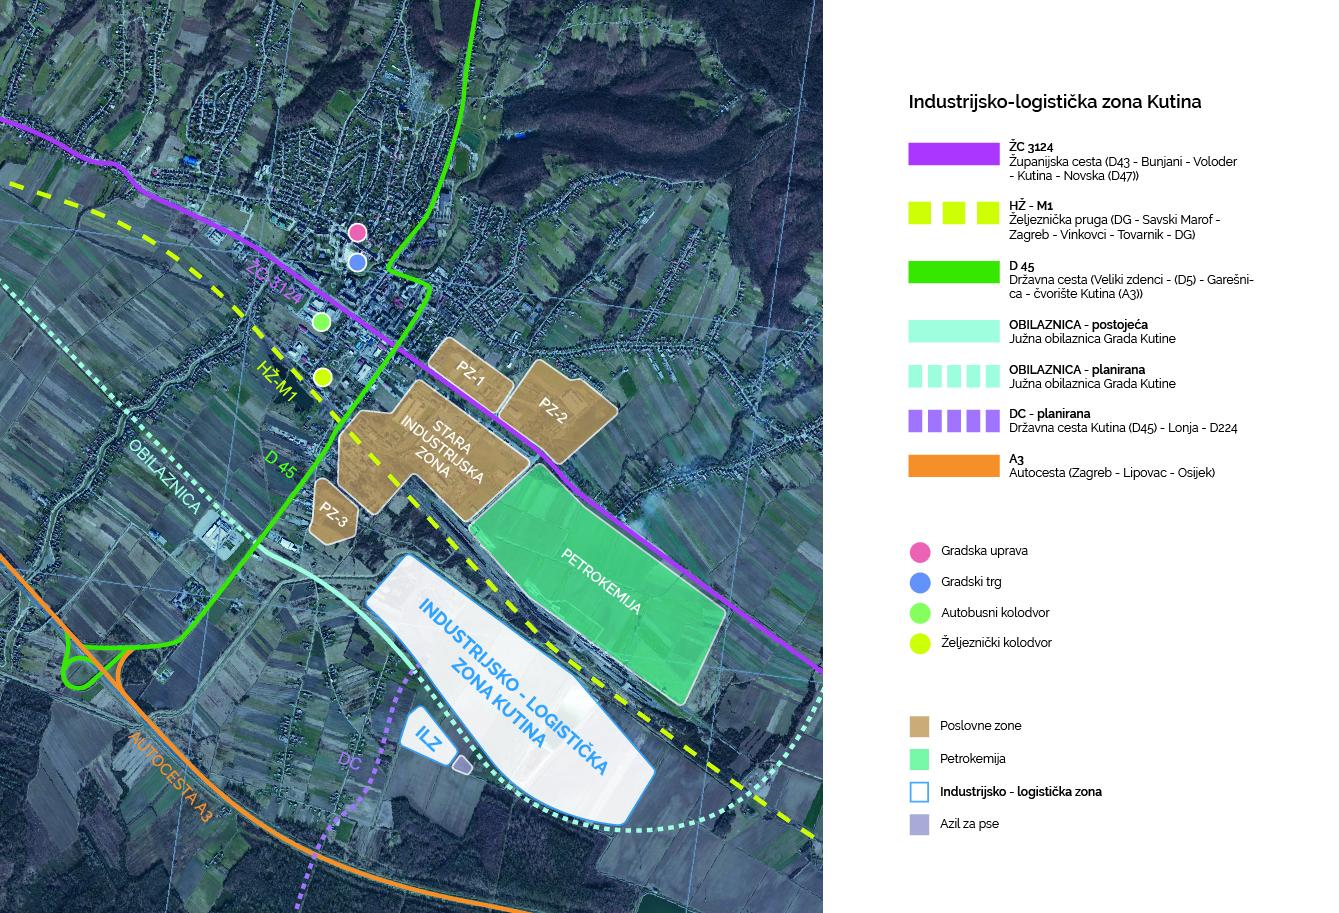 Kutina, Grad Kutina, Industrijsko Logistička Zona, ILZ, KIND